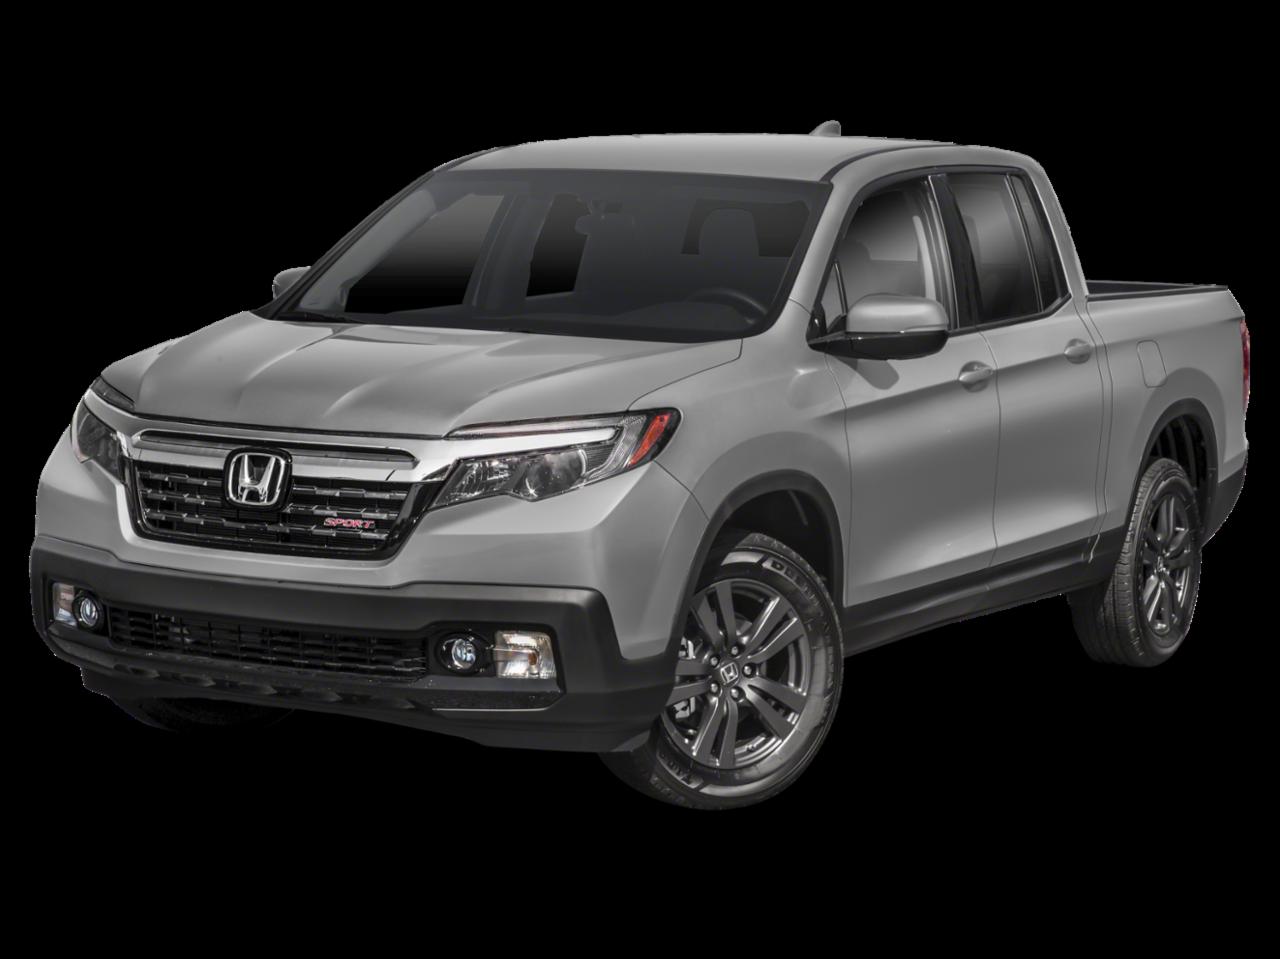 2019 Honda Ridgeline Sport Truck